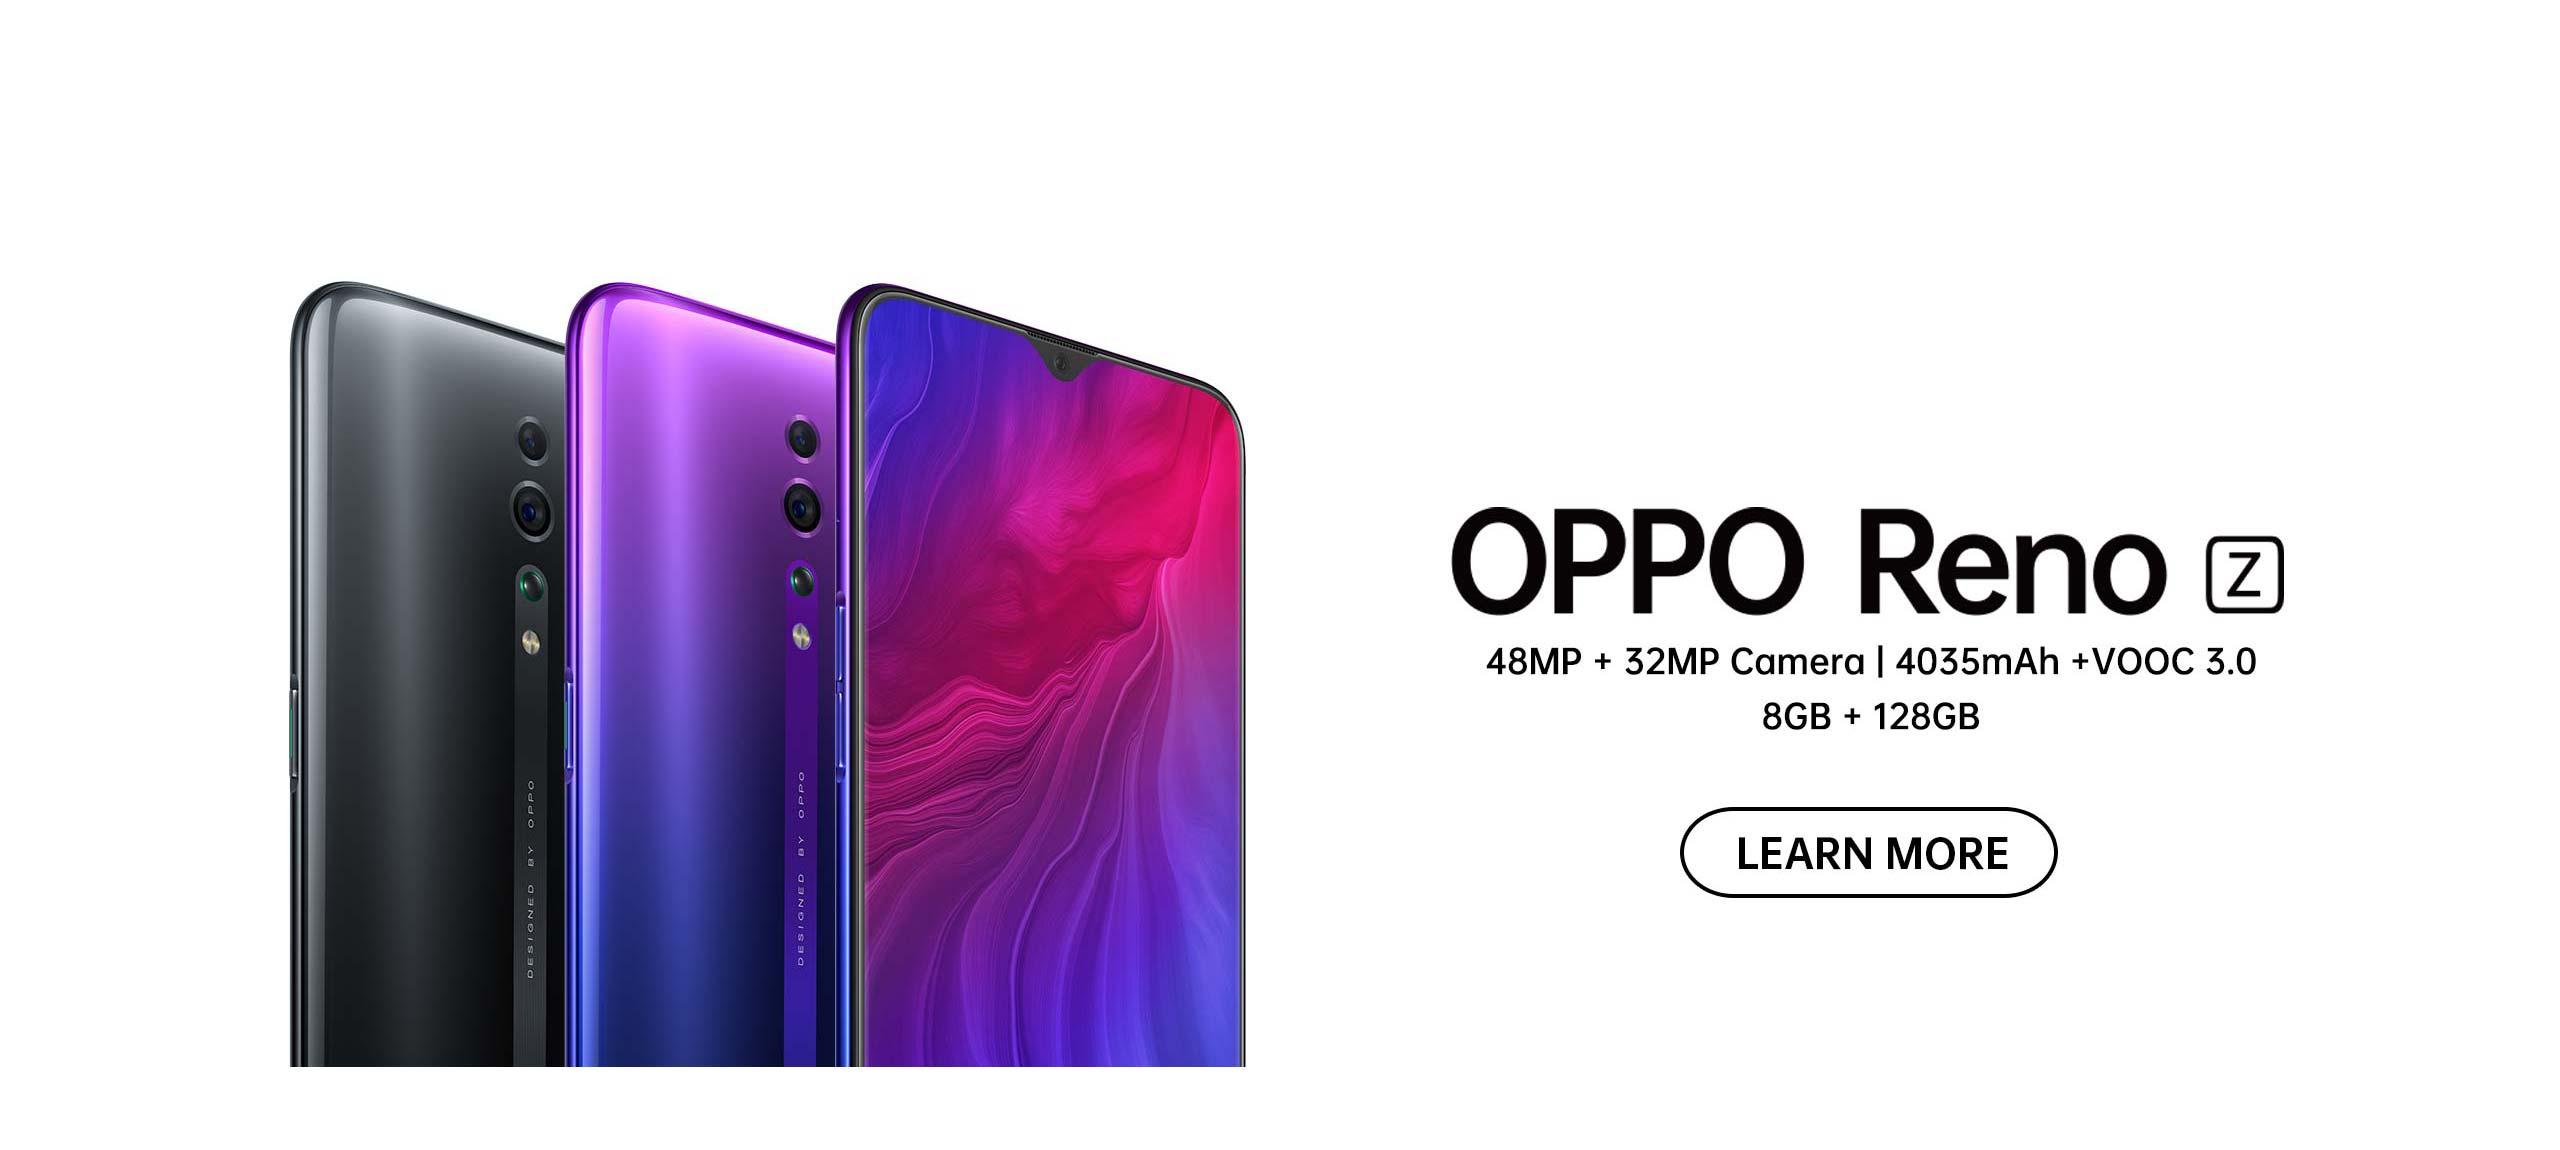 Airp Oppo O Free Review - Disun